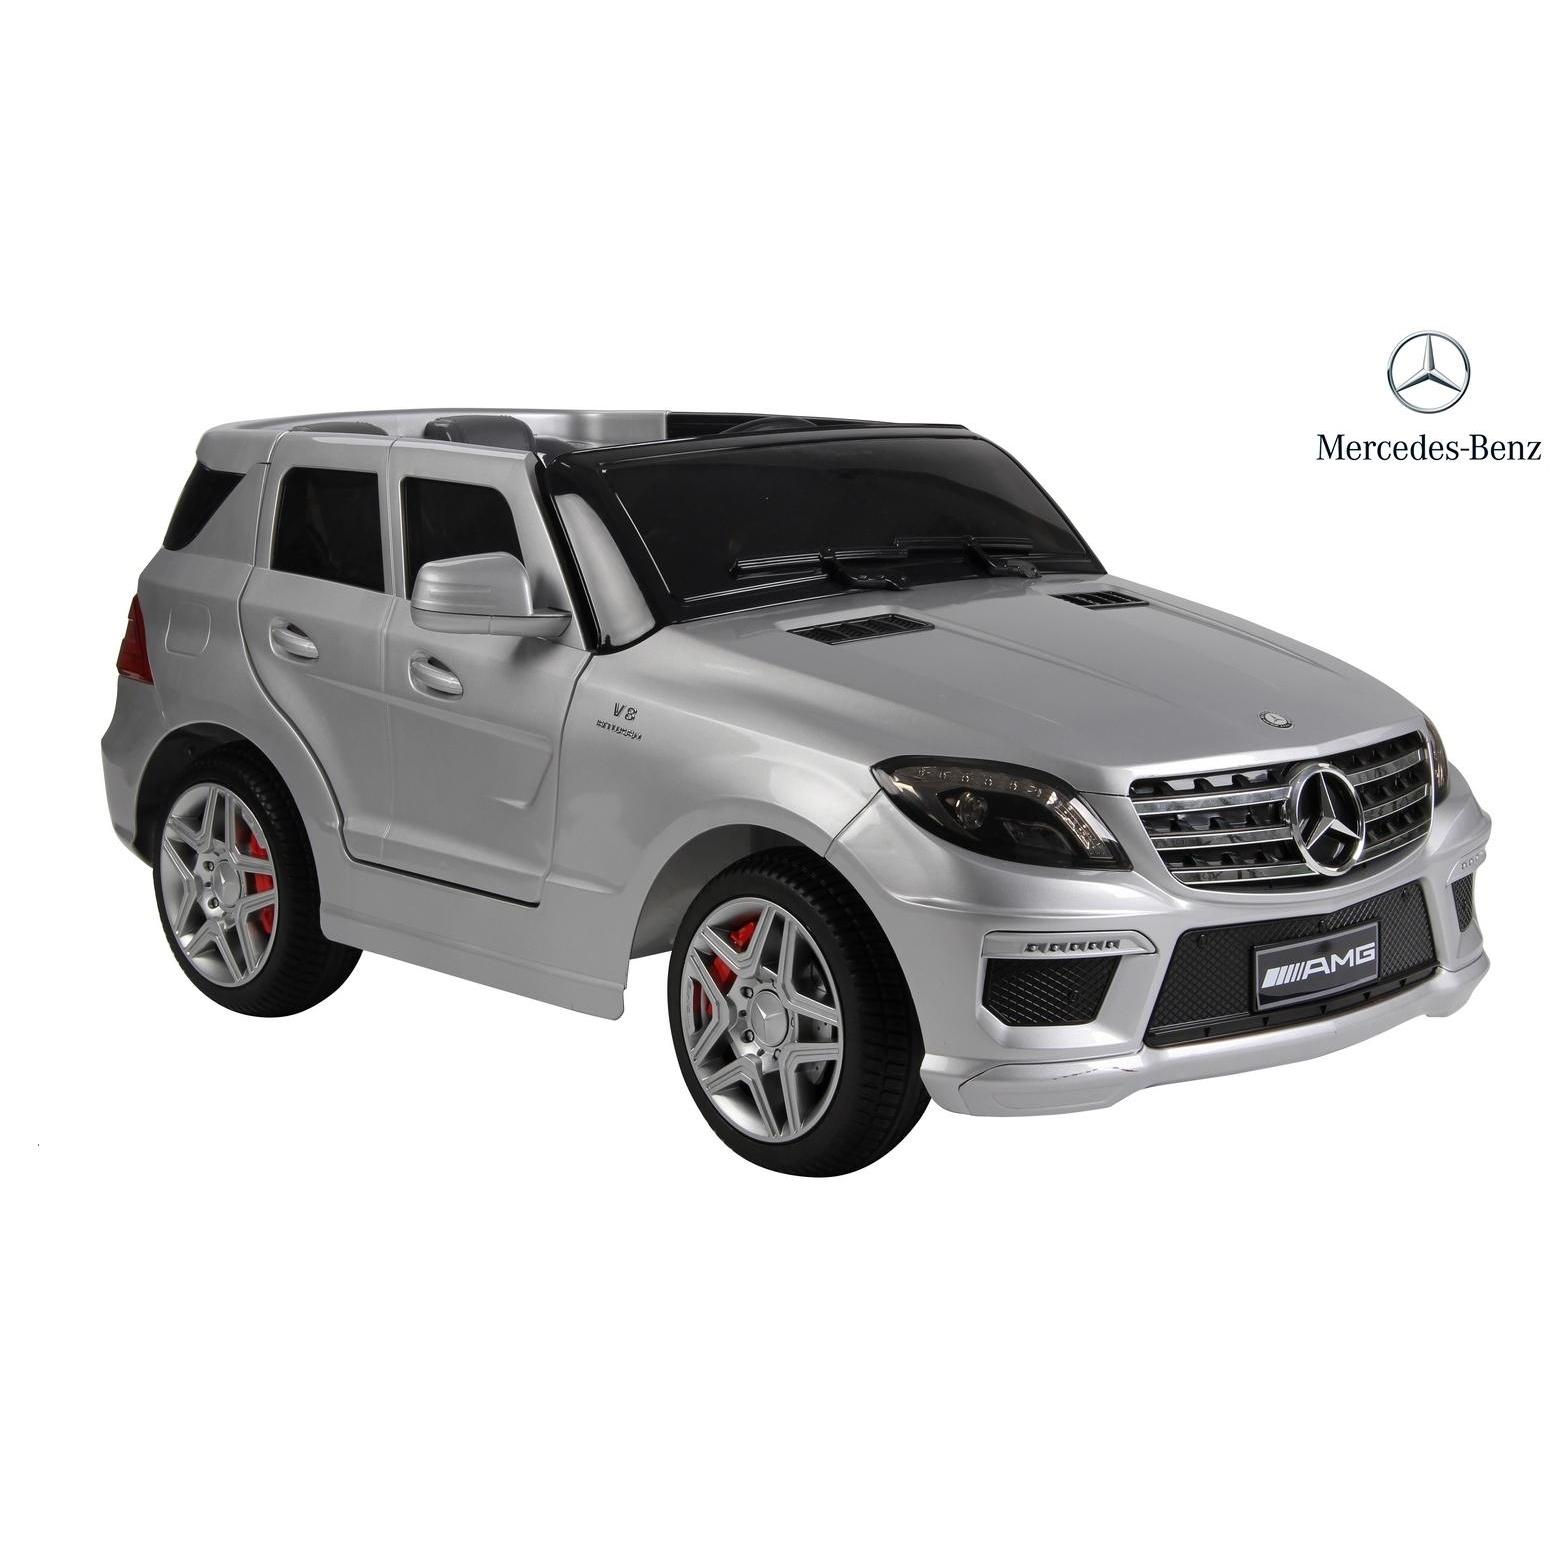 ������������� RT Mercedes-Bens AMG Silver